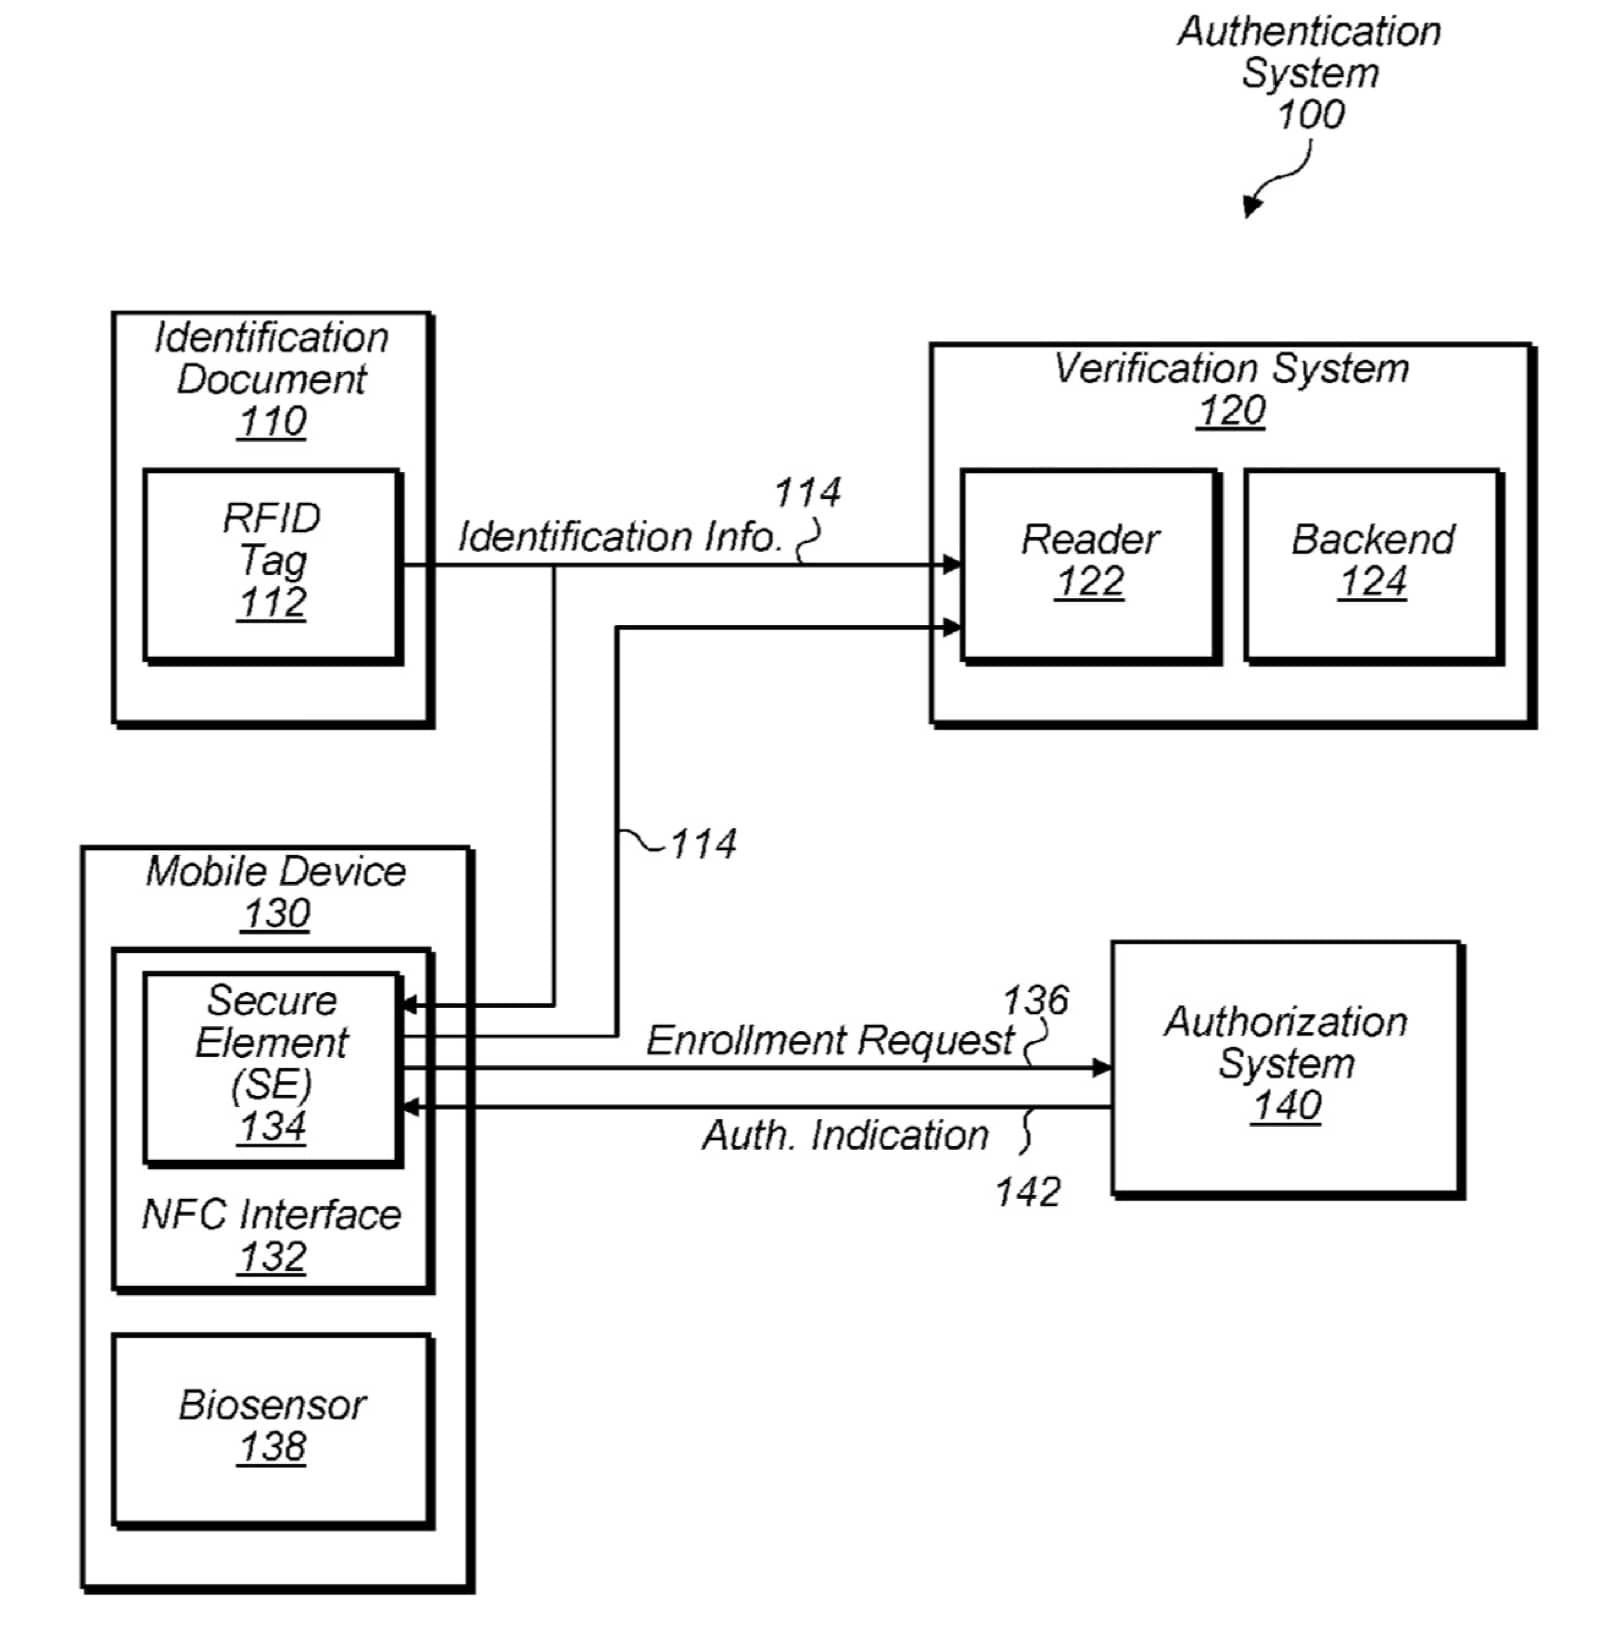 Image of he iPhone passport patent filing.